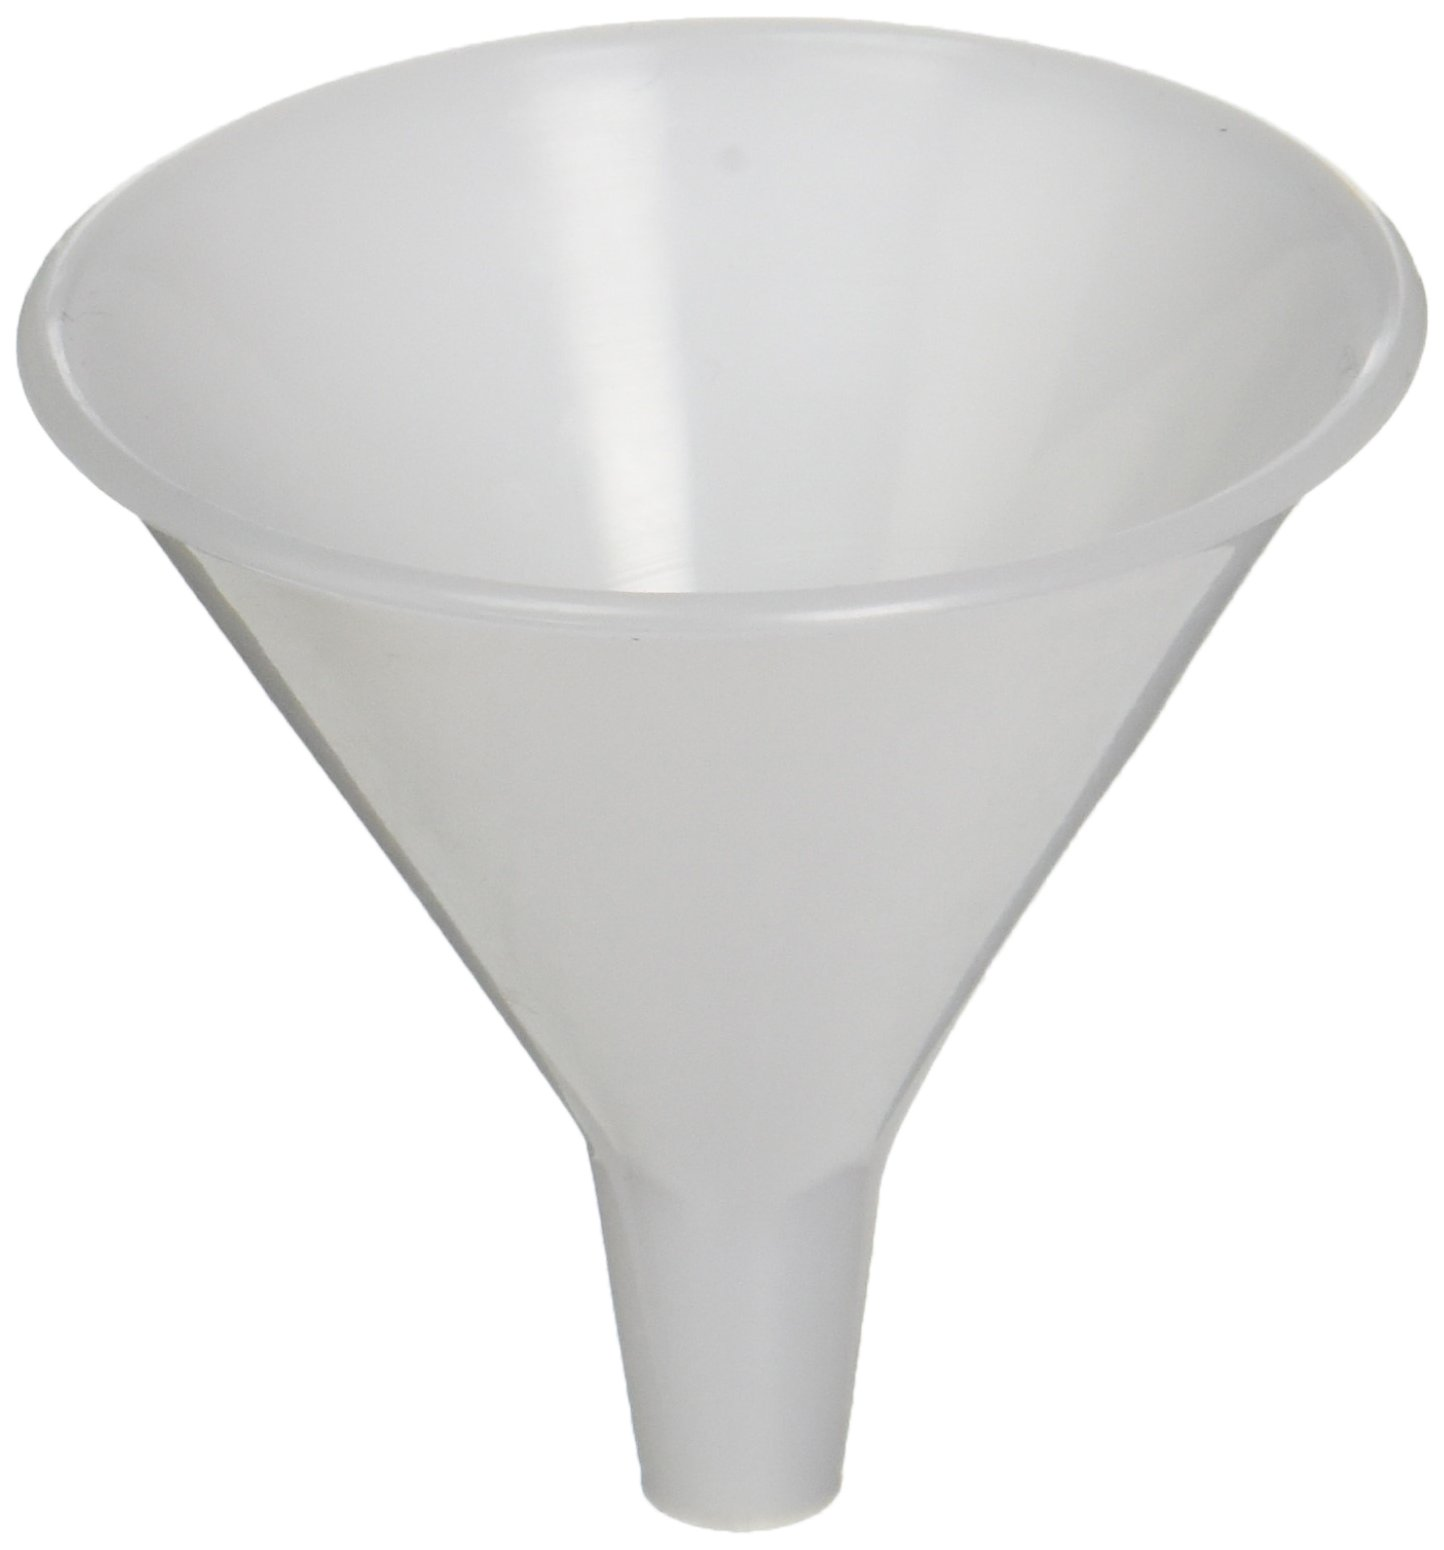 United Scientific FHD165 High Density Polyethylene Clear Short Stem Funnels, 65ml Capacity (Pack of 12)